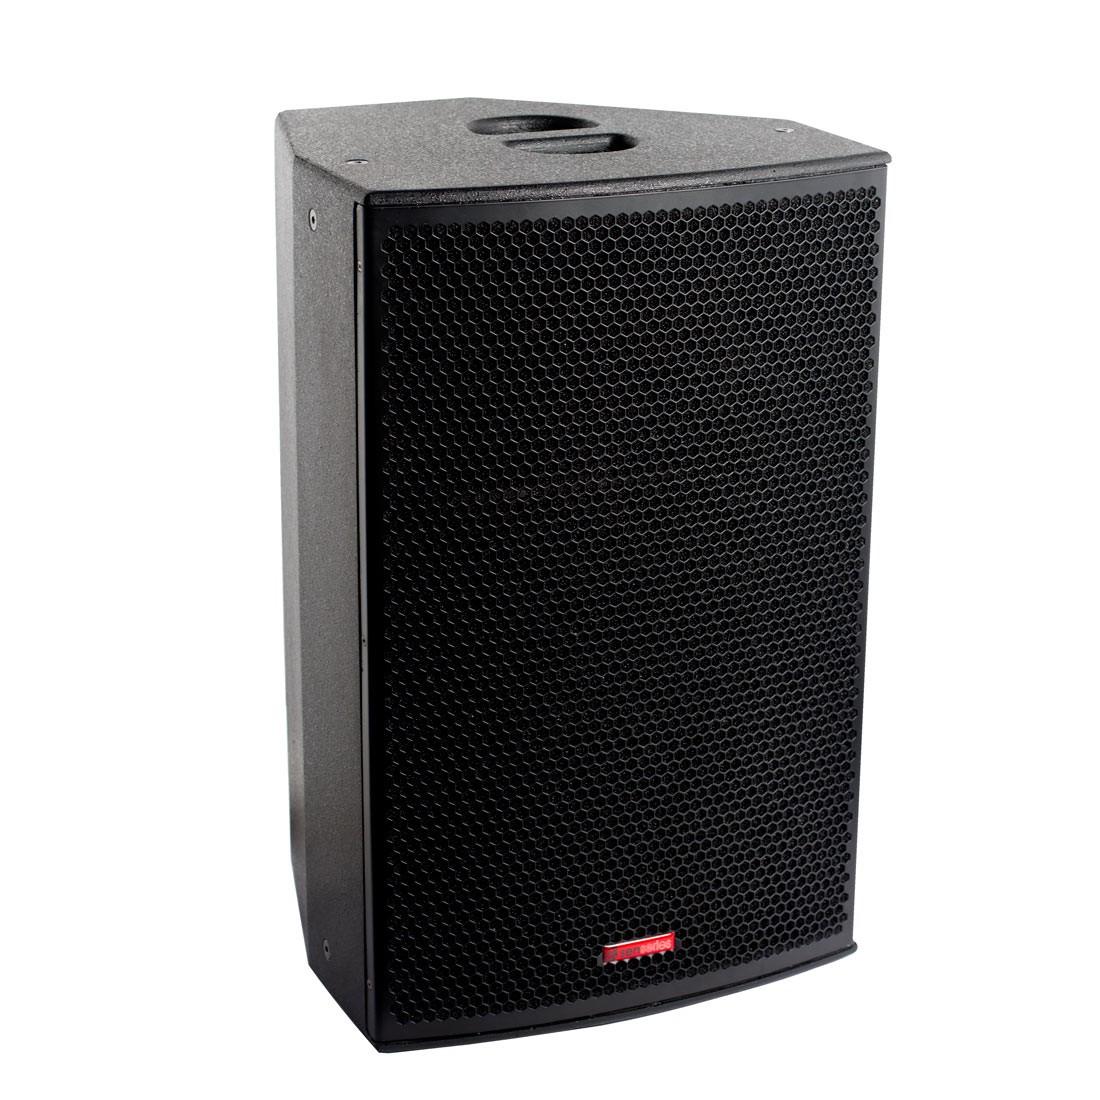 Image of   American Audio Sense 15 Højttaler (400 Watt RMS 8 Ohm)